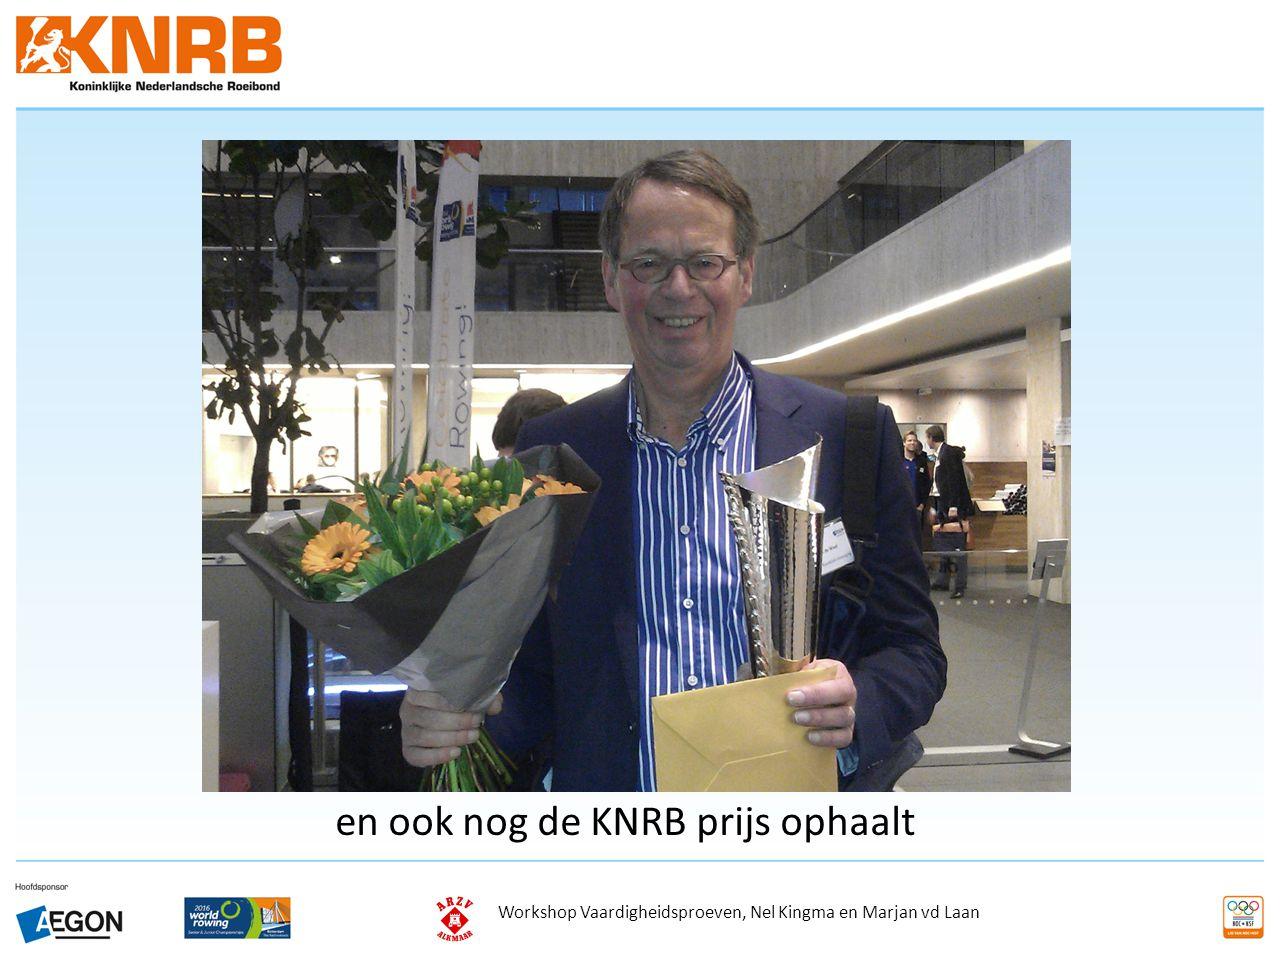 Workshop Vaardigheidsproeven, Nel Kingma en Marjan vd Laan en ook nog de KNRB prijs ophaalt